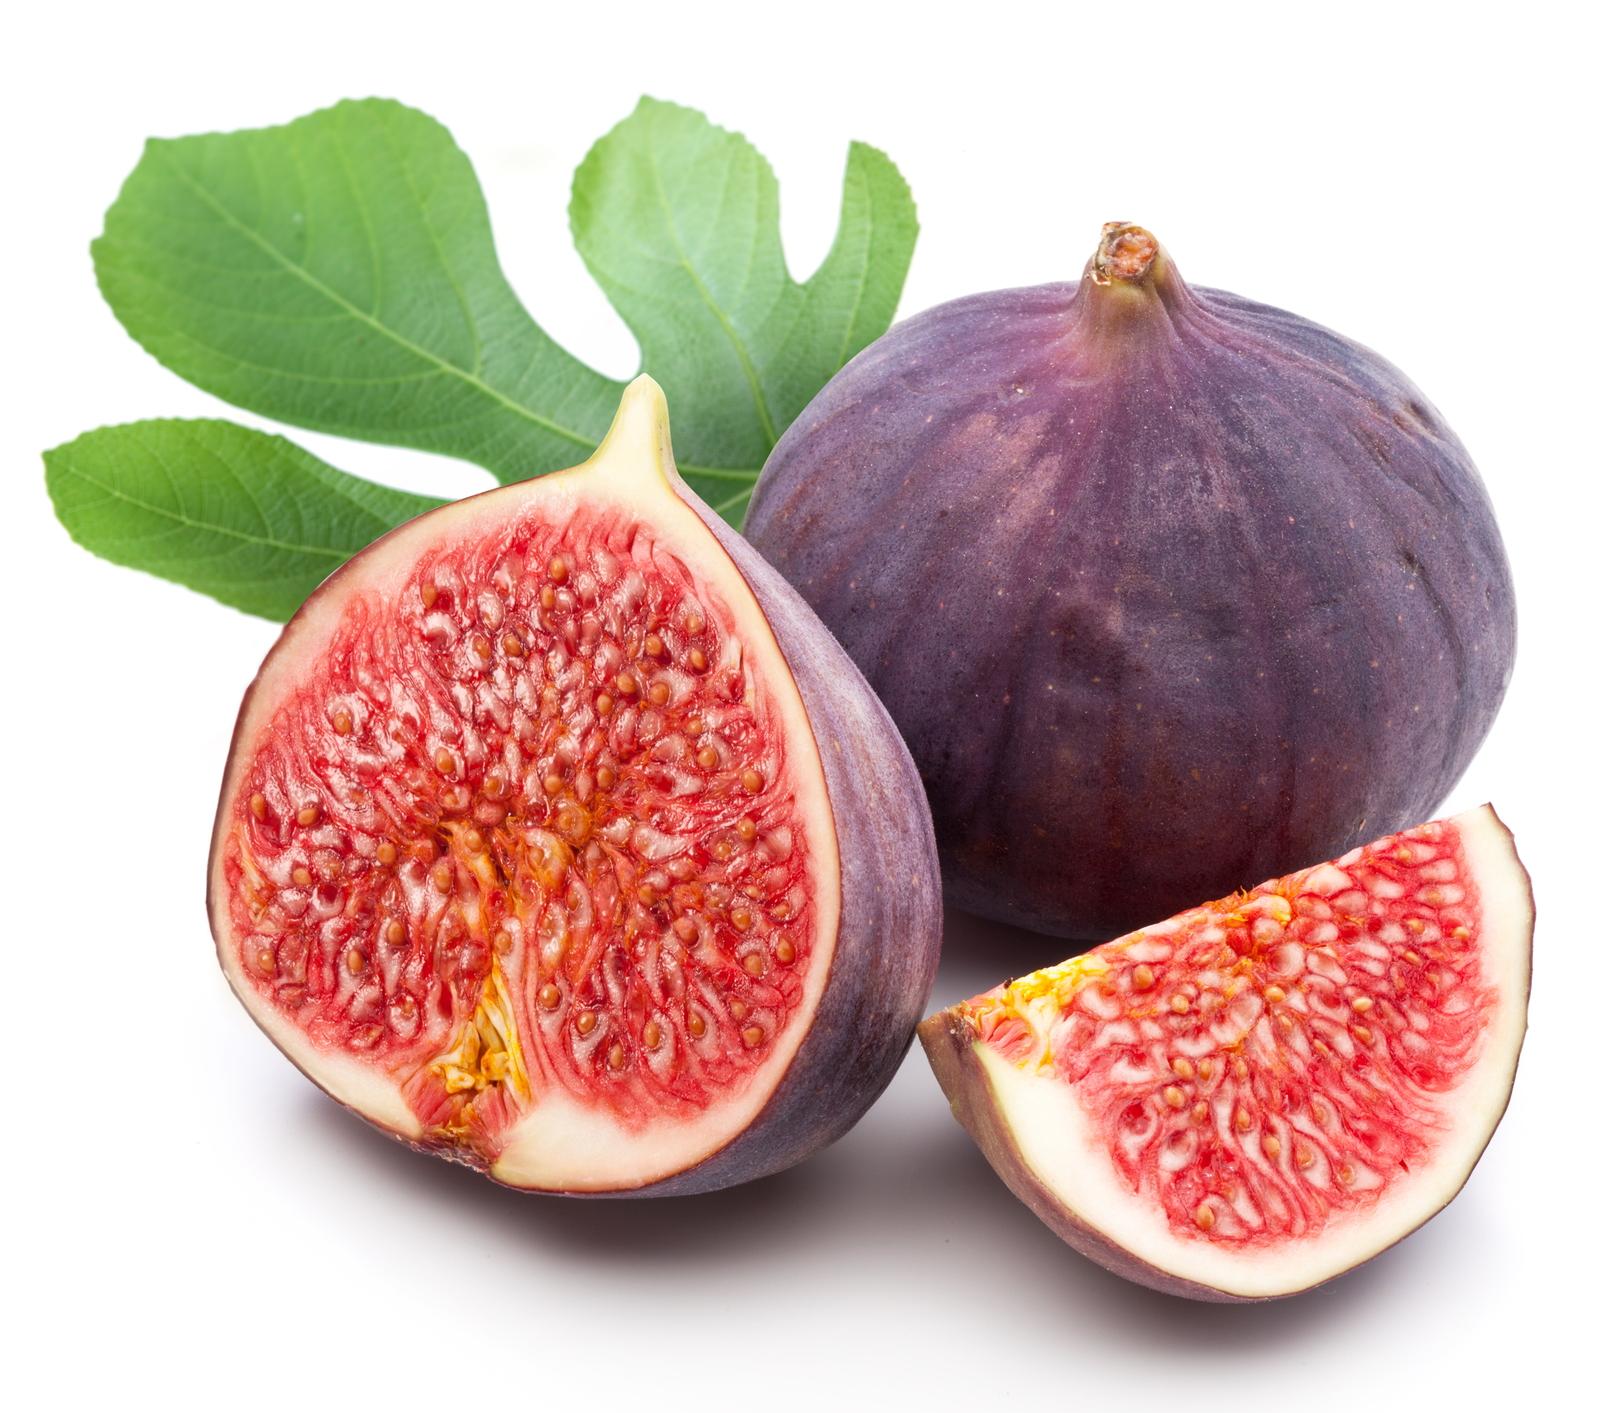 perierga.gr - 10 τροφές με σούπερ αφροδισιακές ιδιότητες!